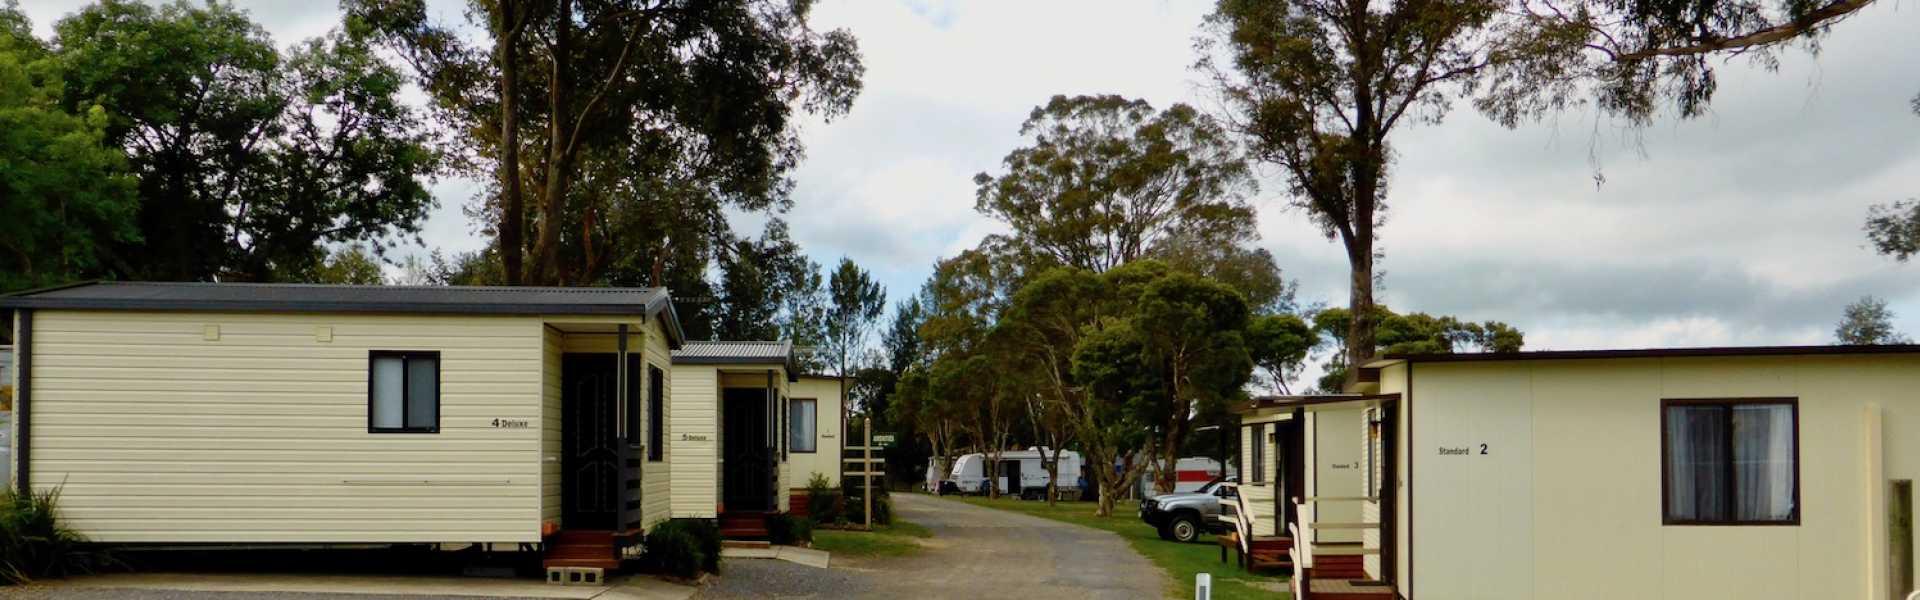 Kui Parks, Moss Vale Village Park, Cabins